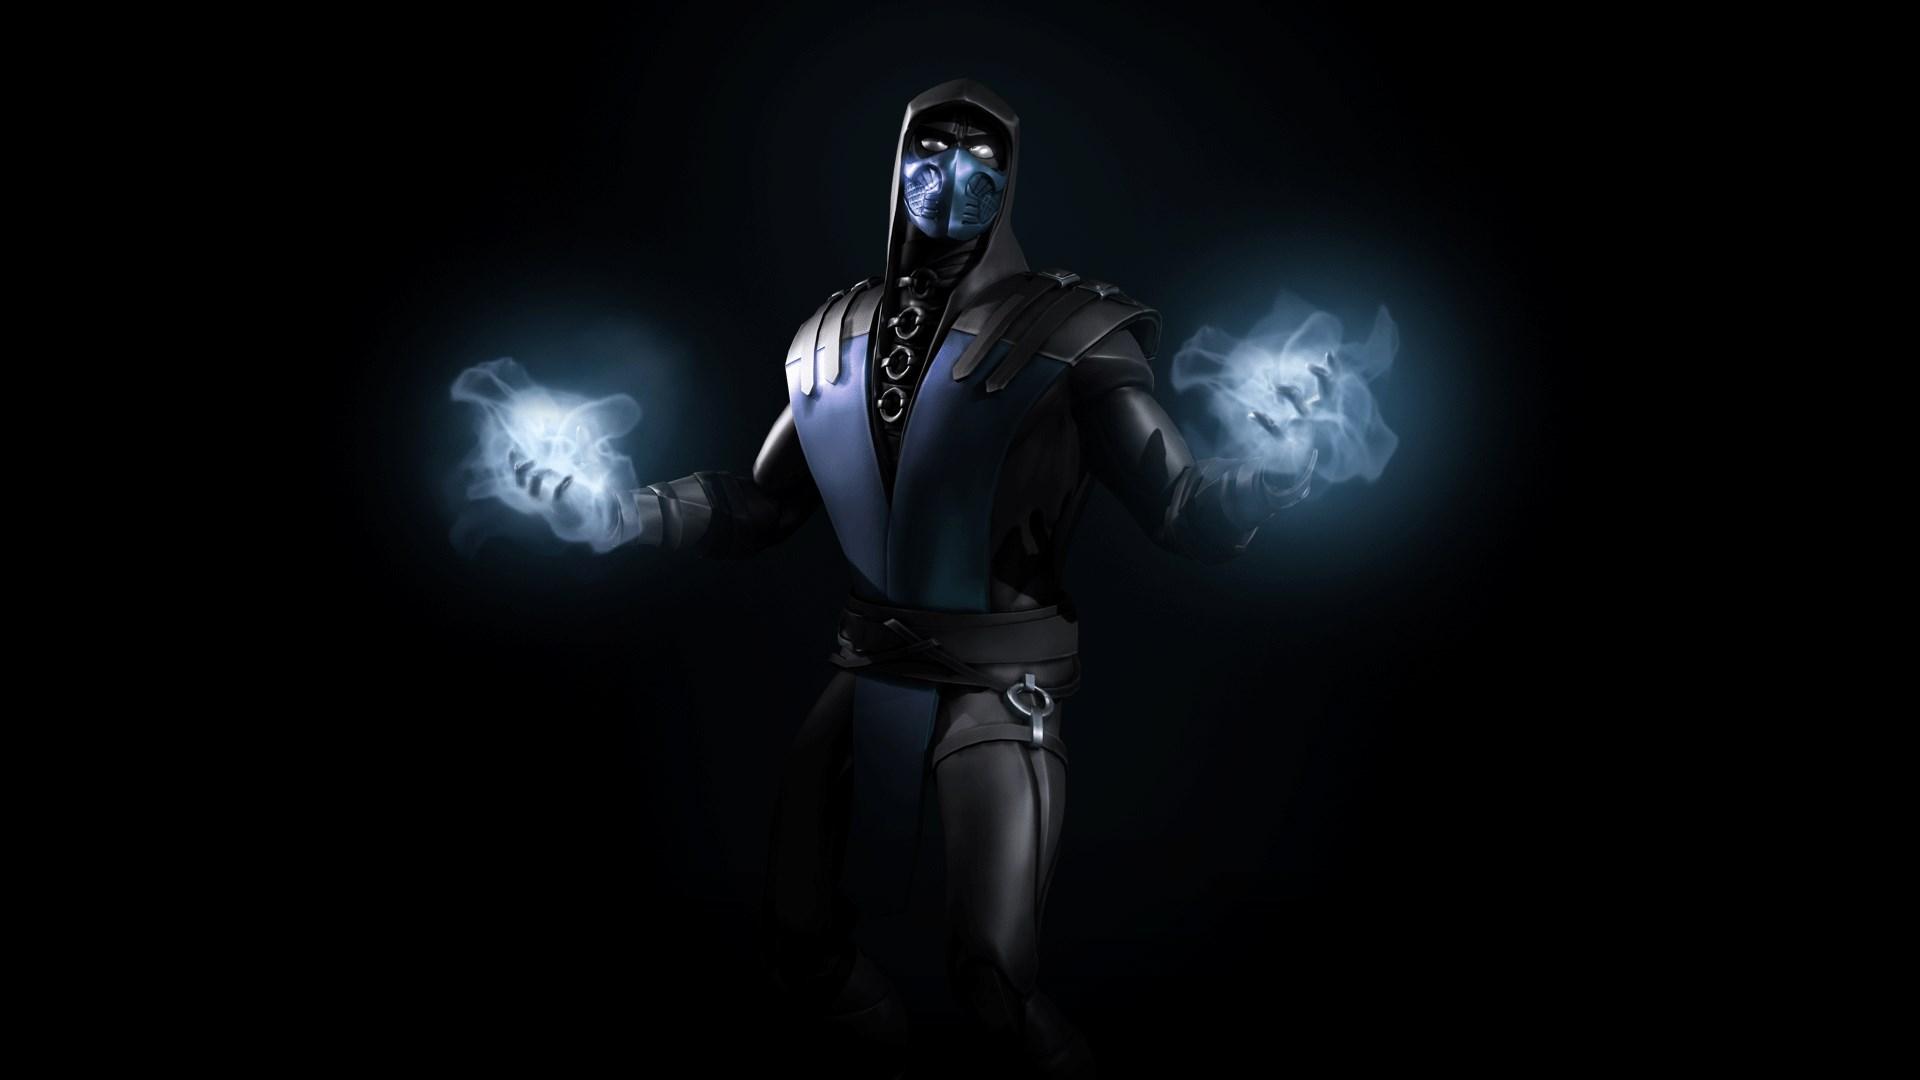 Blue Steel Sub-Zero